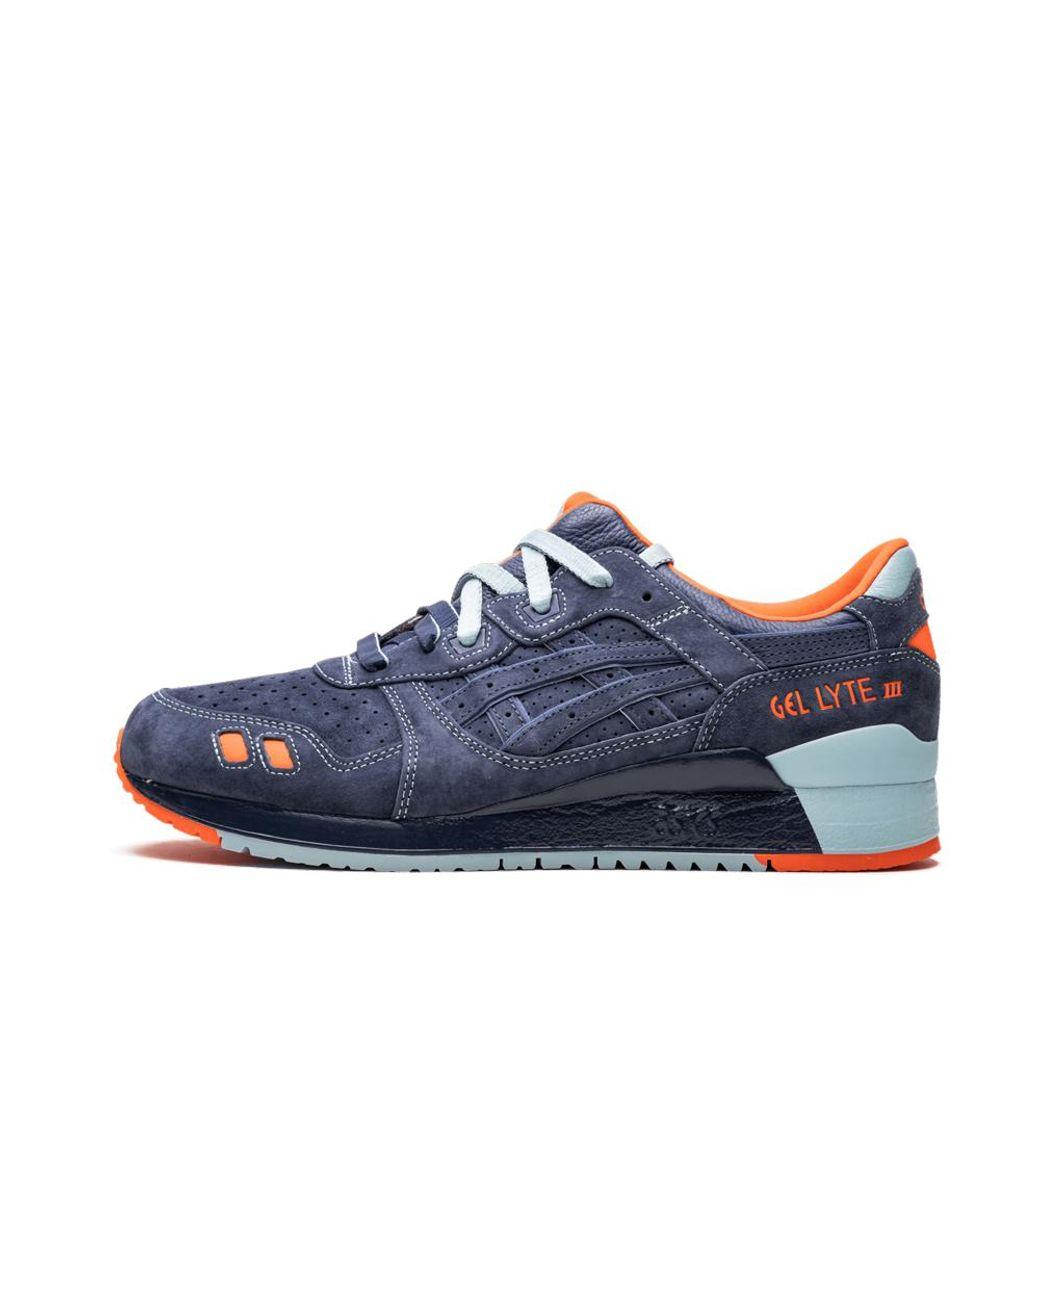 Asics Suede Gel-lyte 3 'pensole' Shoes